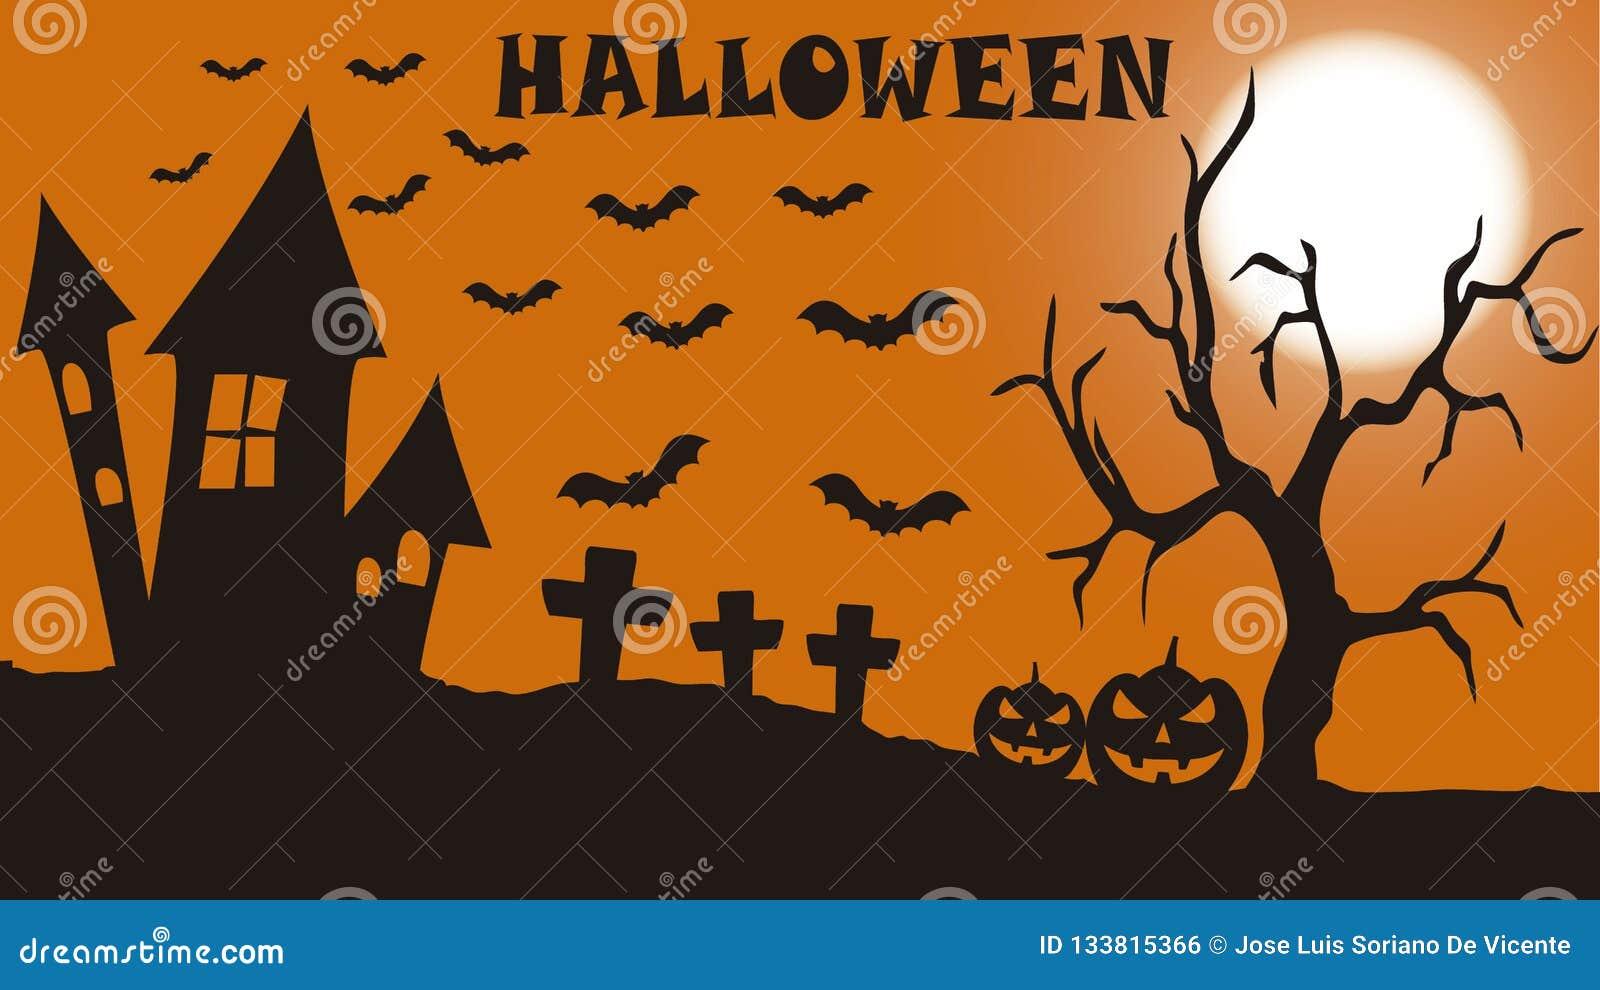 Terrifying cemetery for Halloween night